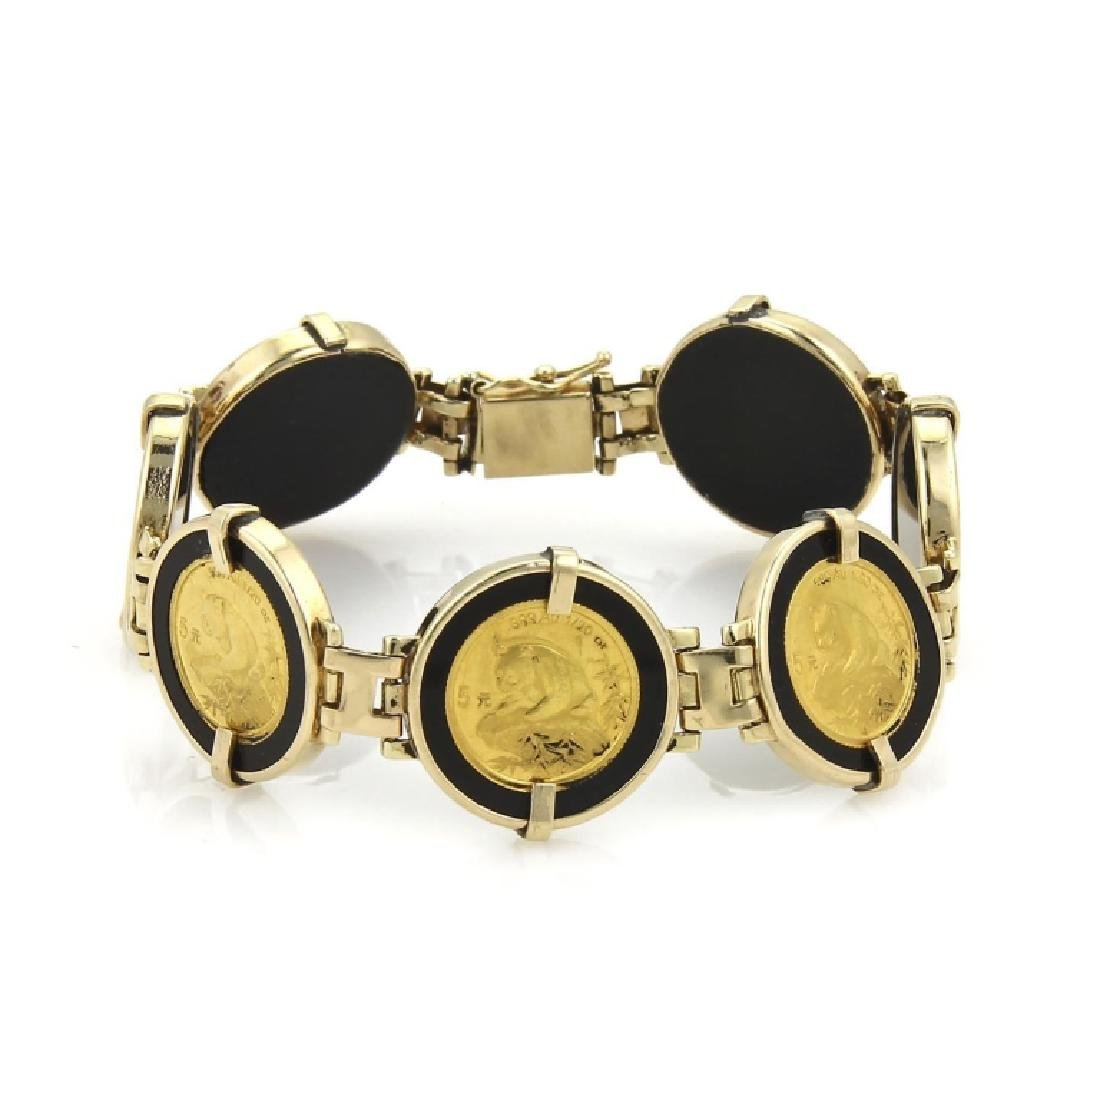 24k Gold Panda Coin Onyx 14k Round Link Bracelet - Feb 09